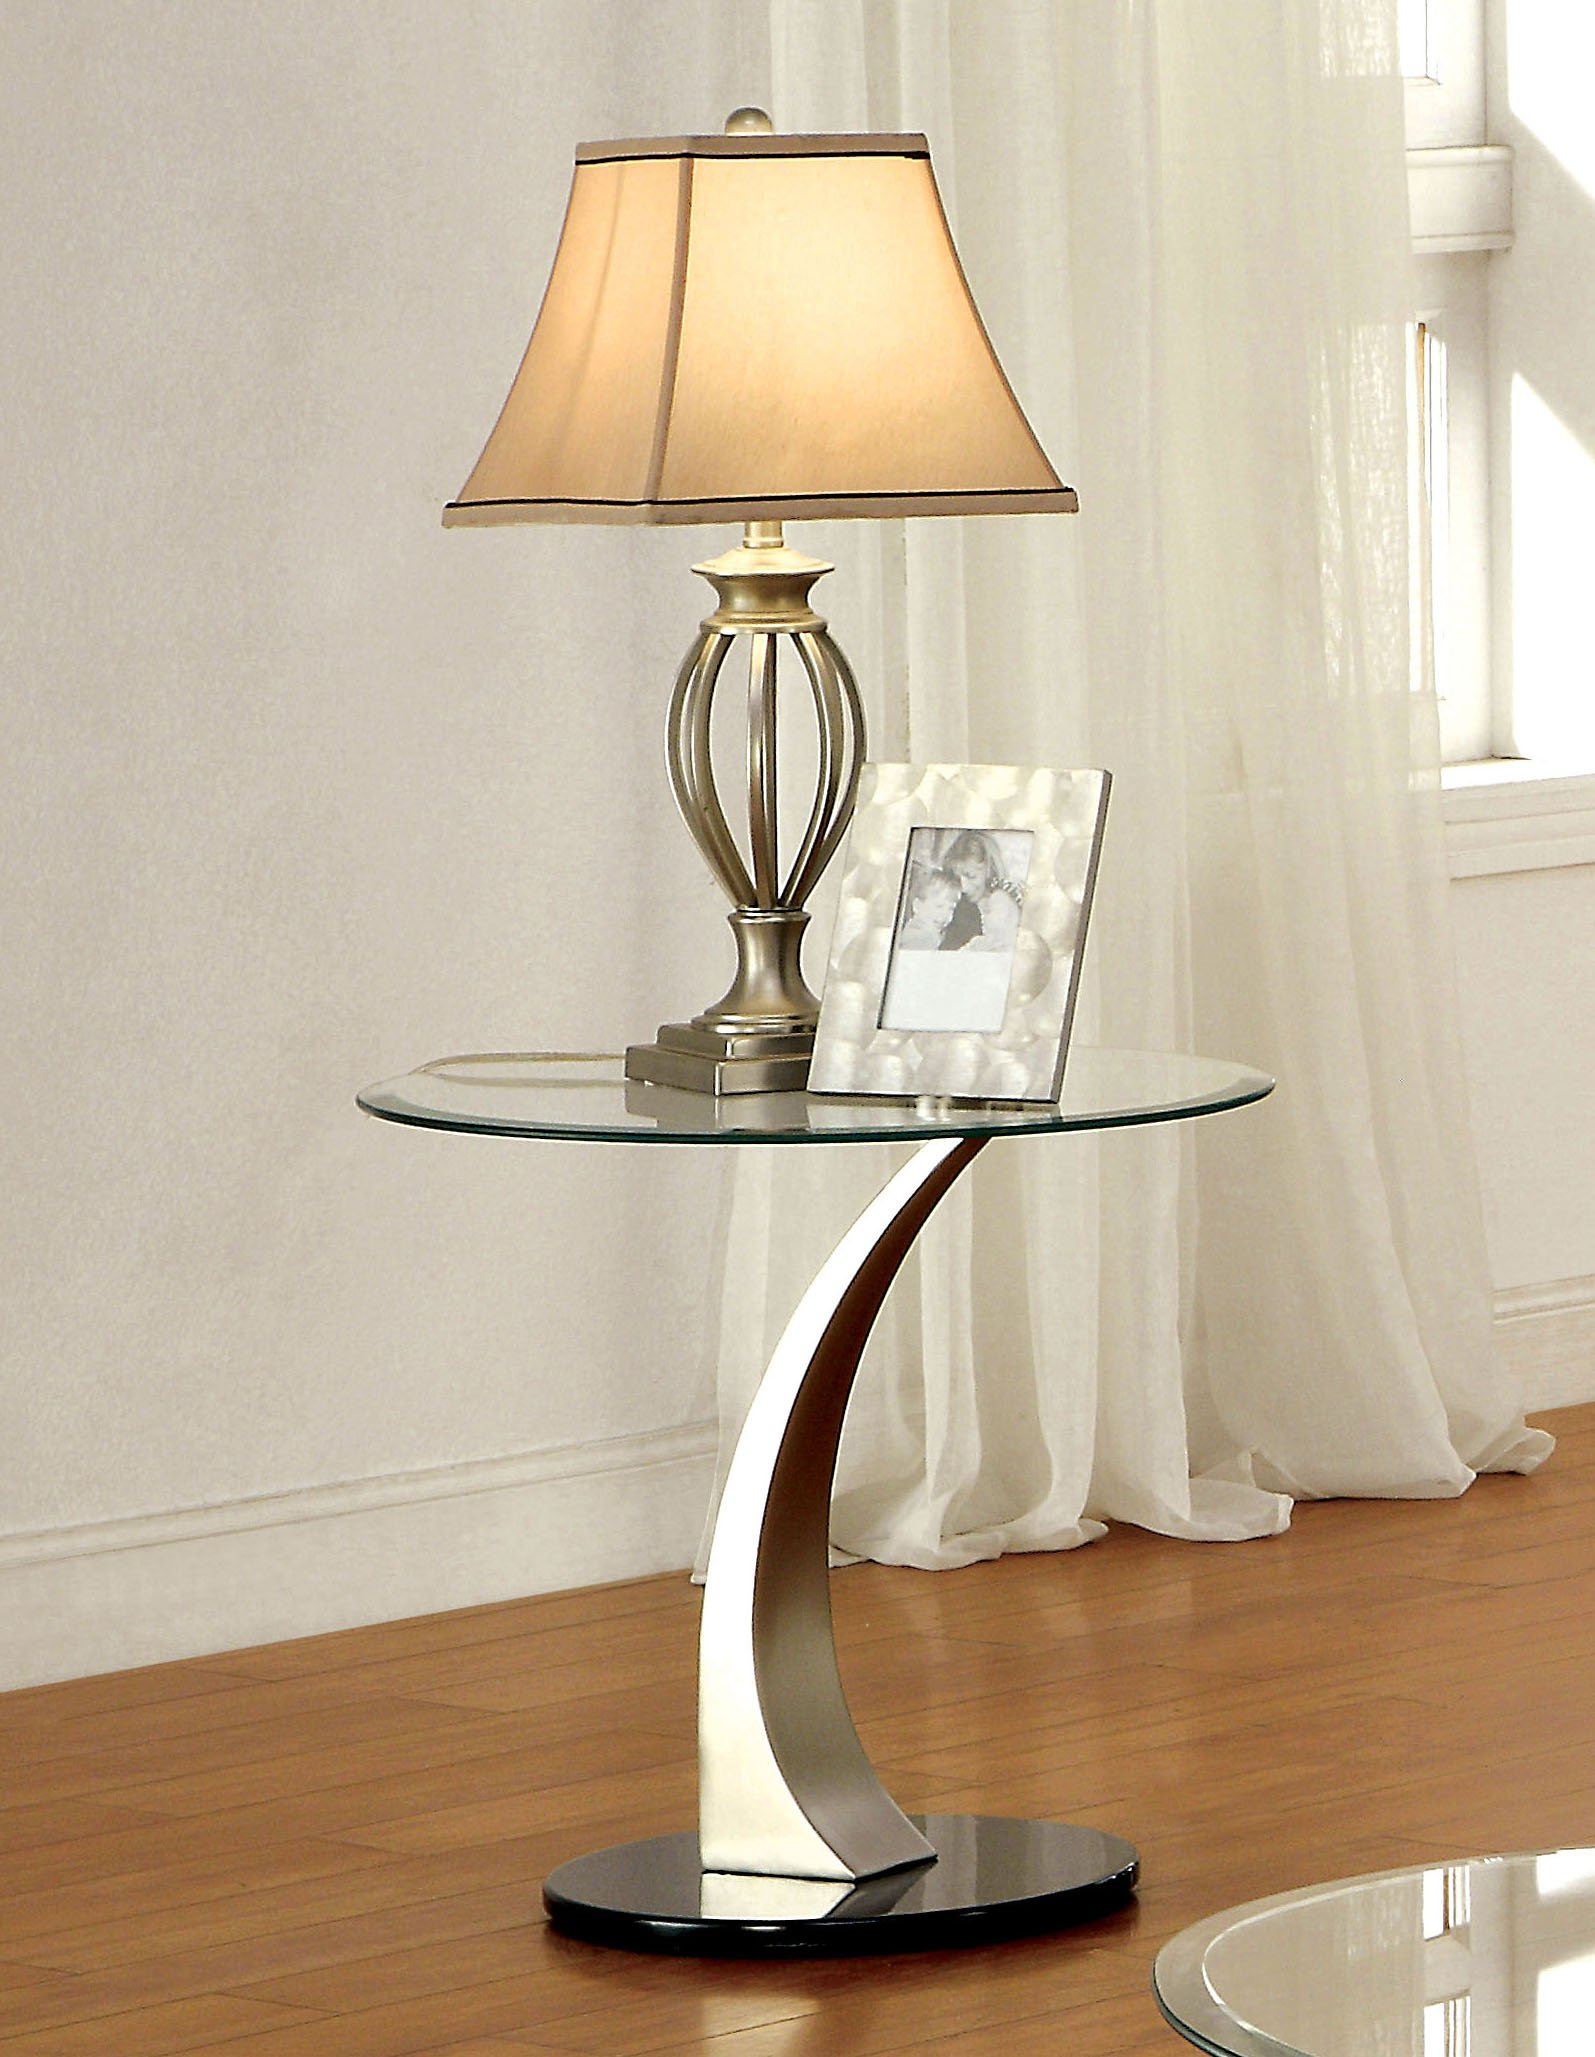 Furniture of America Kassandra Modern End Table, Metallic Finish